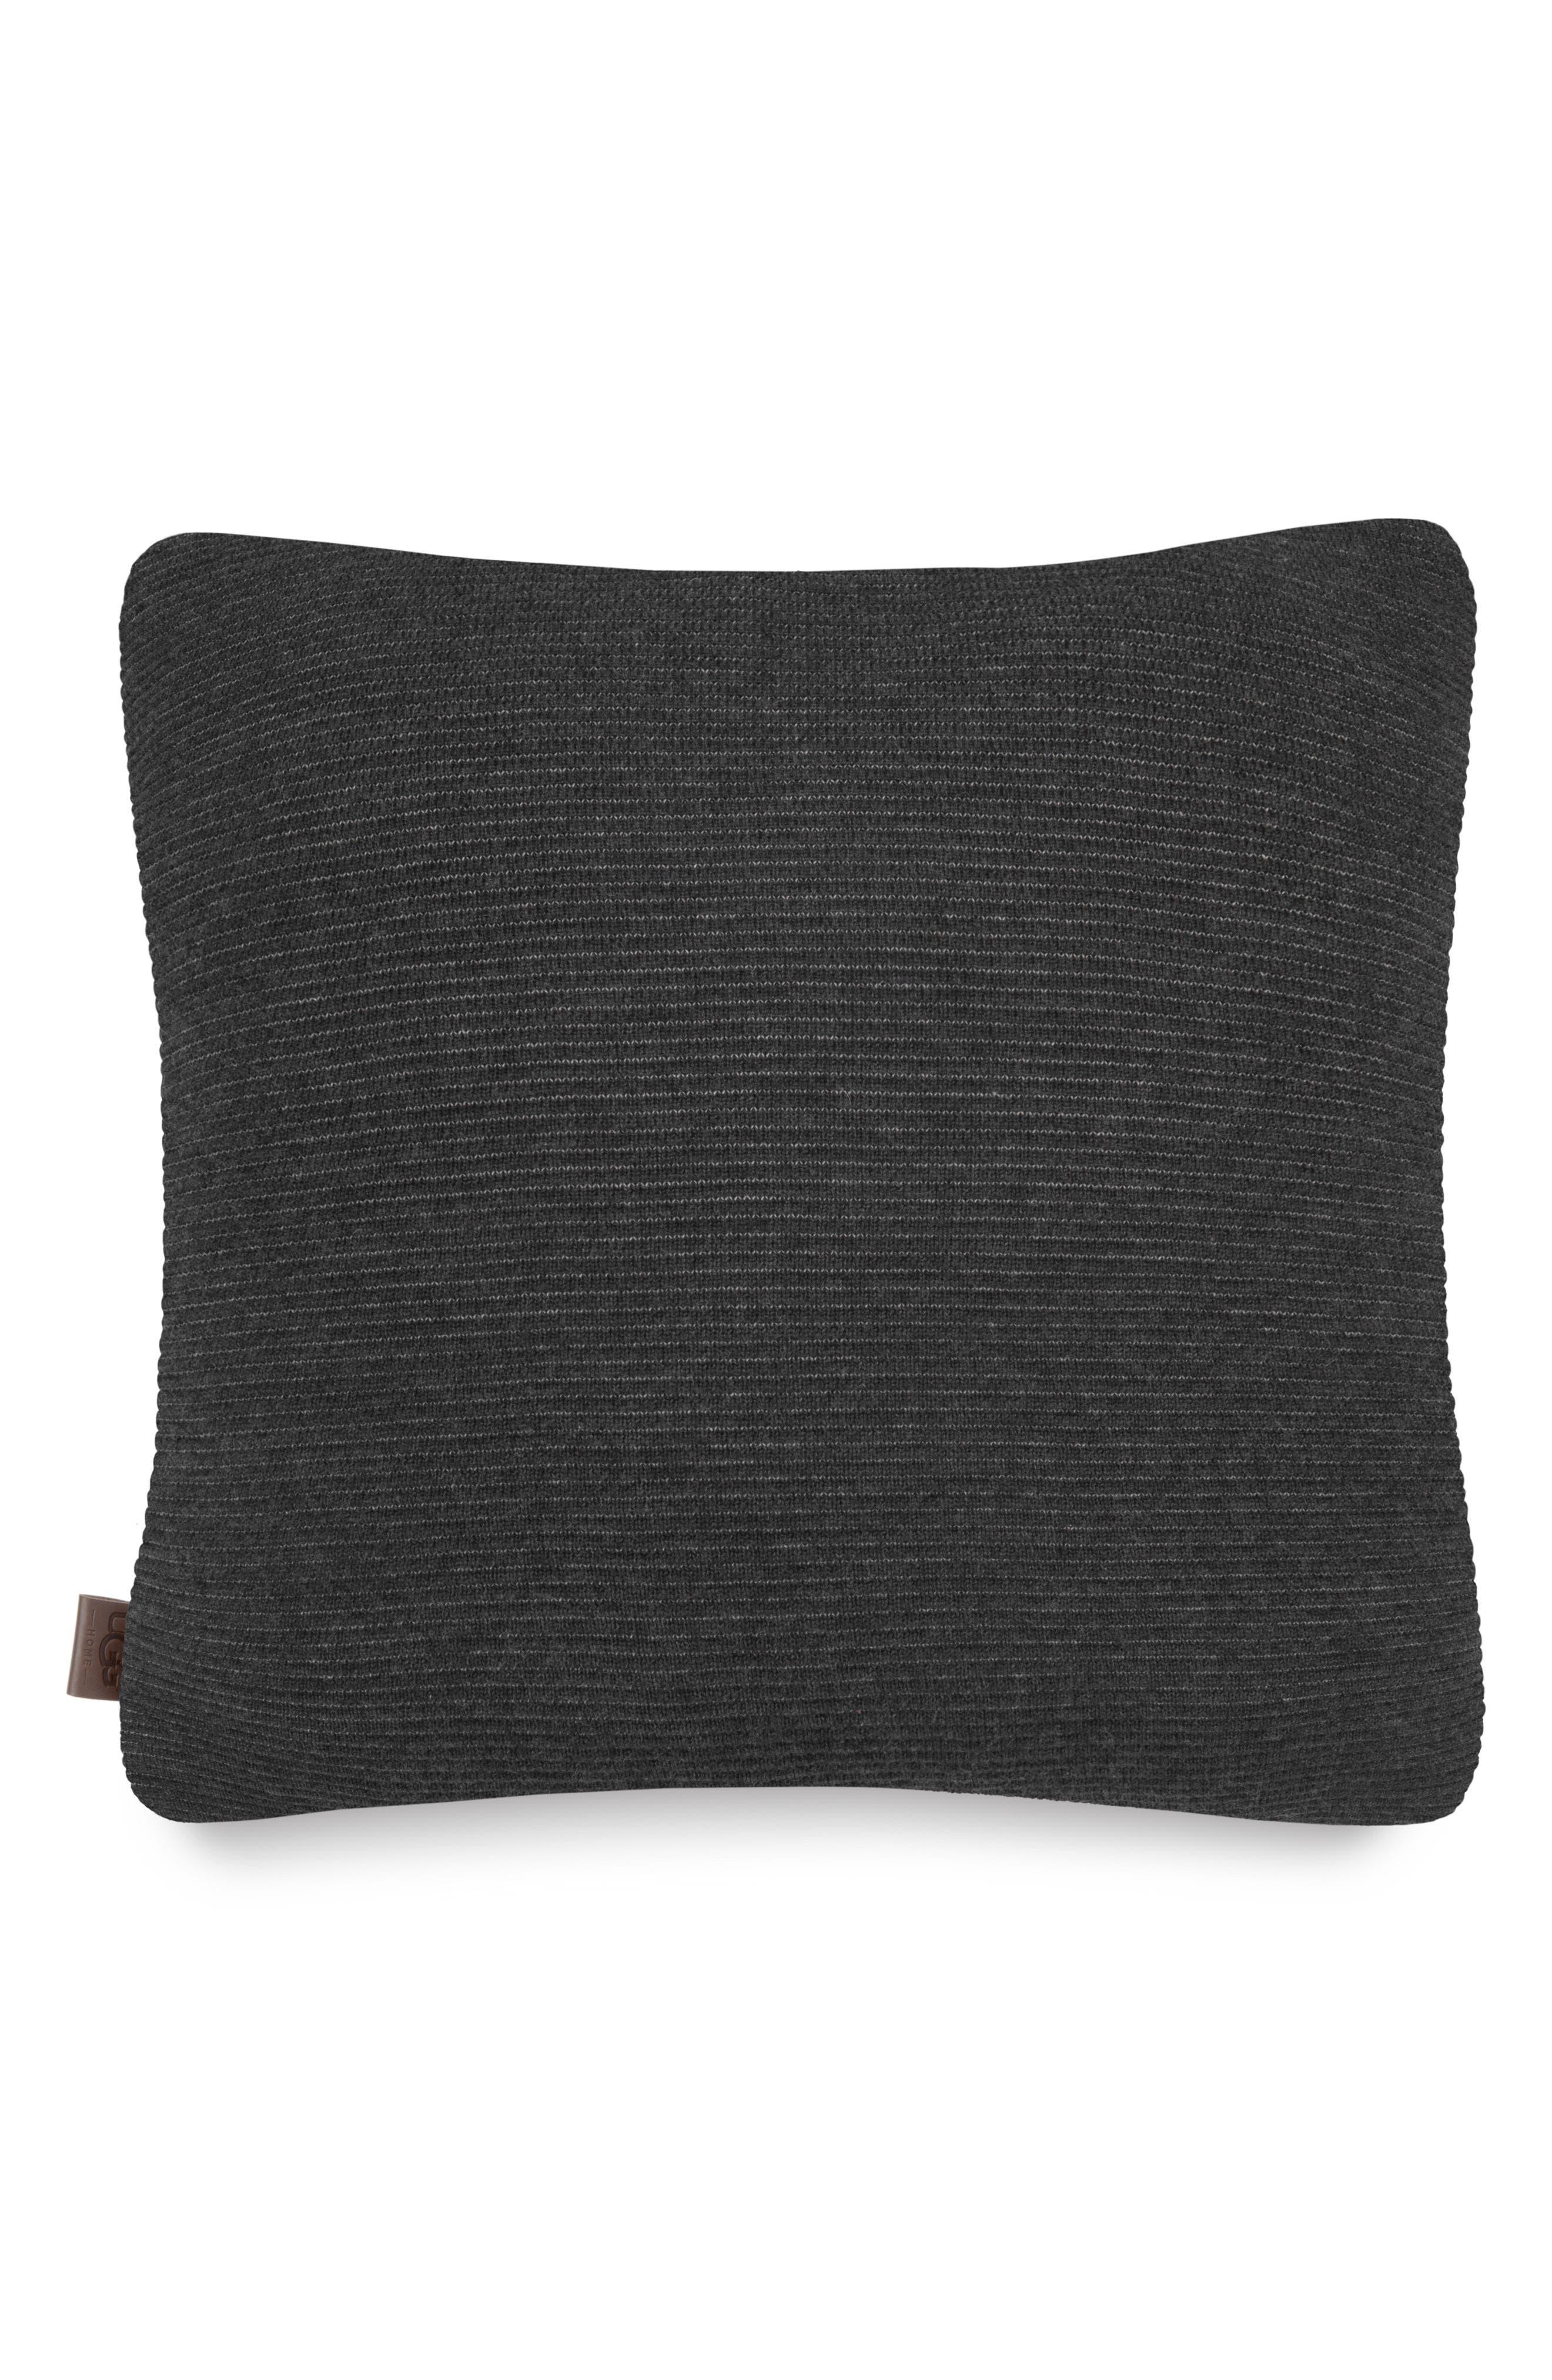 Horizontal Rib Pillow,                         Main,                         color,